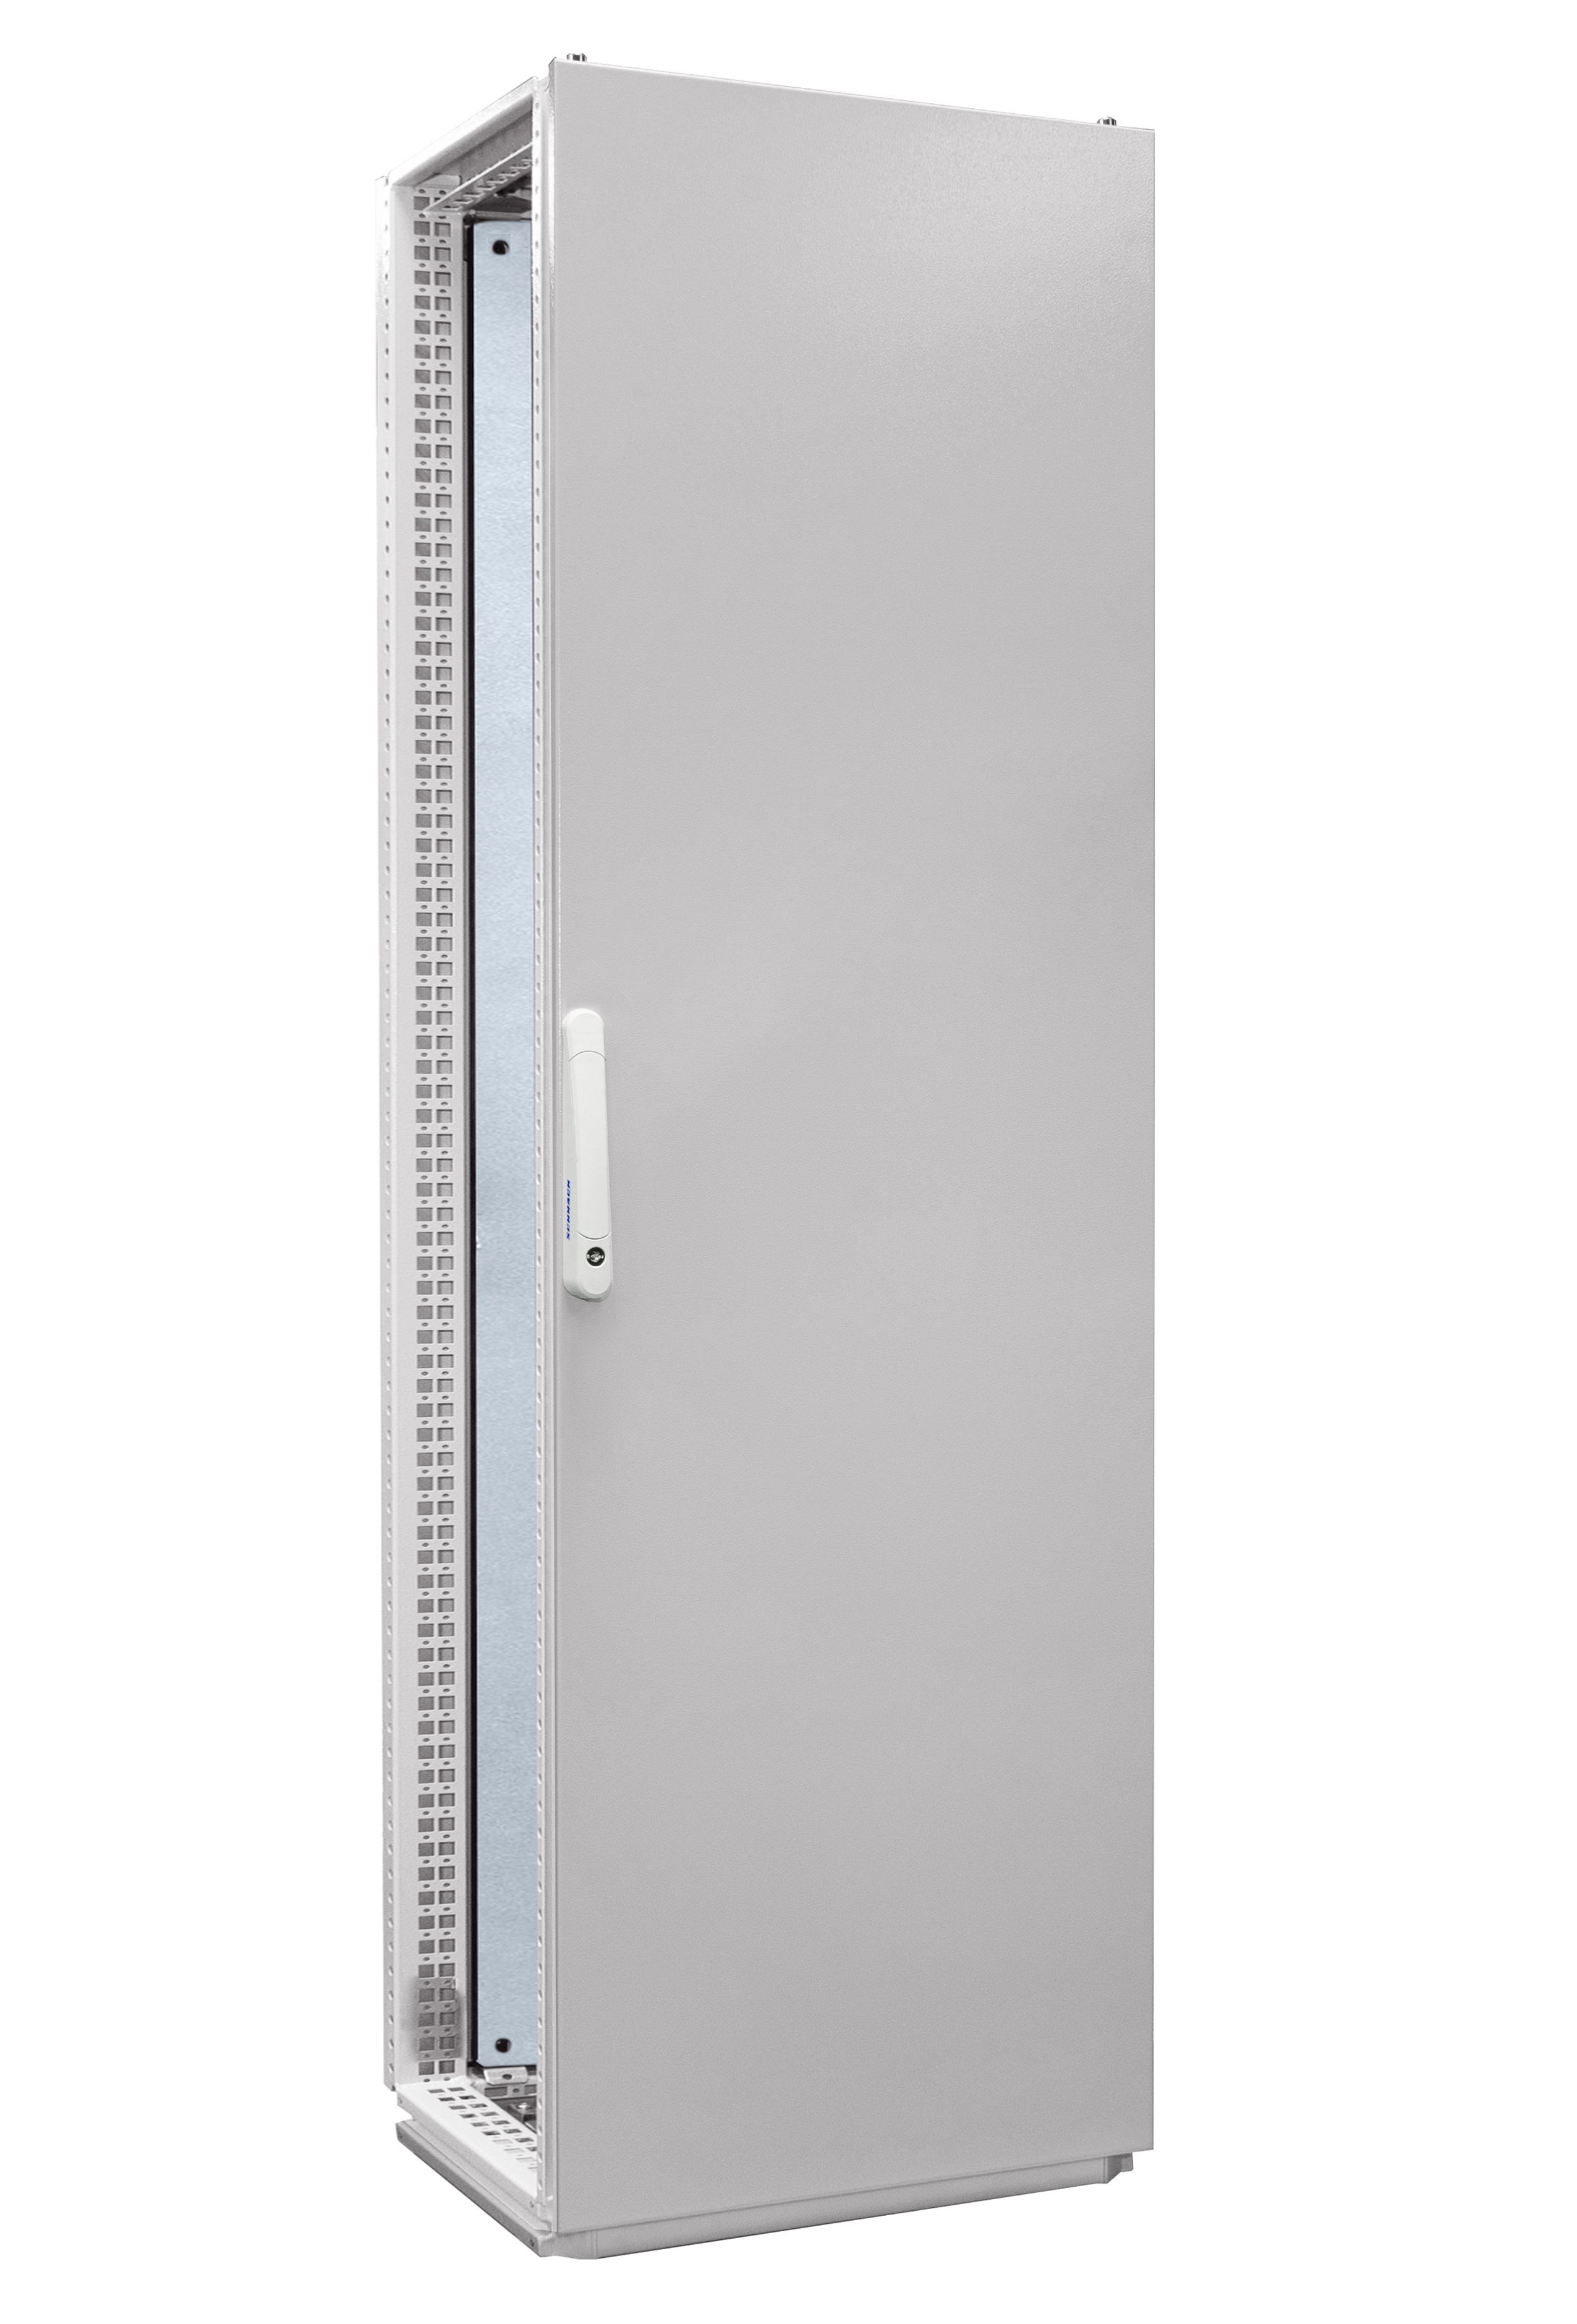 1 Stk Anreihschrank 1-Tür IP55 H=2000 B=600 T=600mm Stahlblech AC206060--